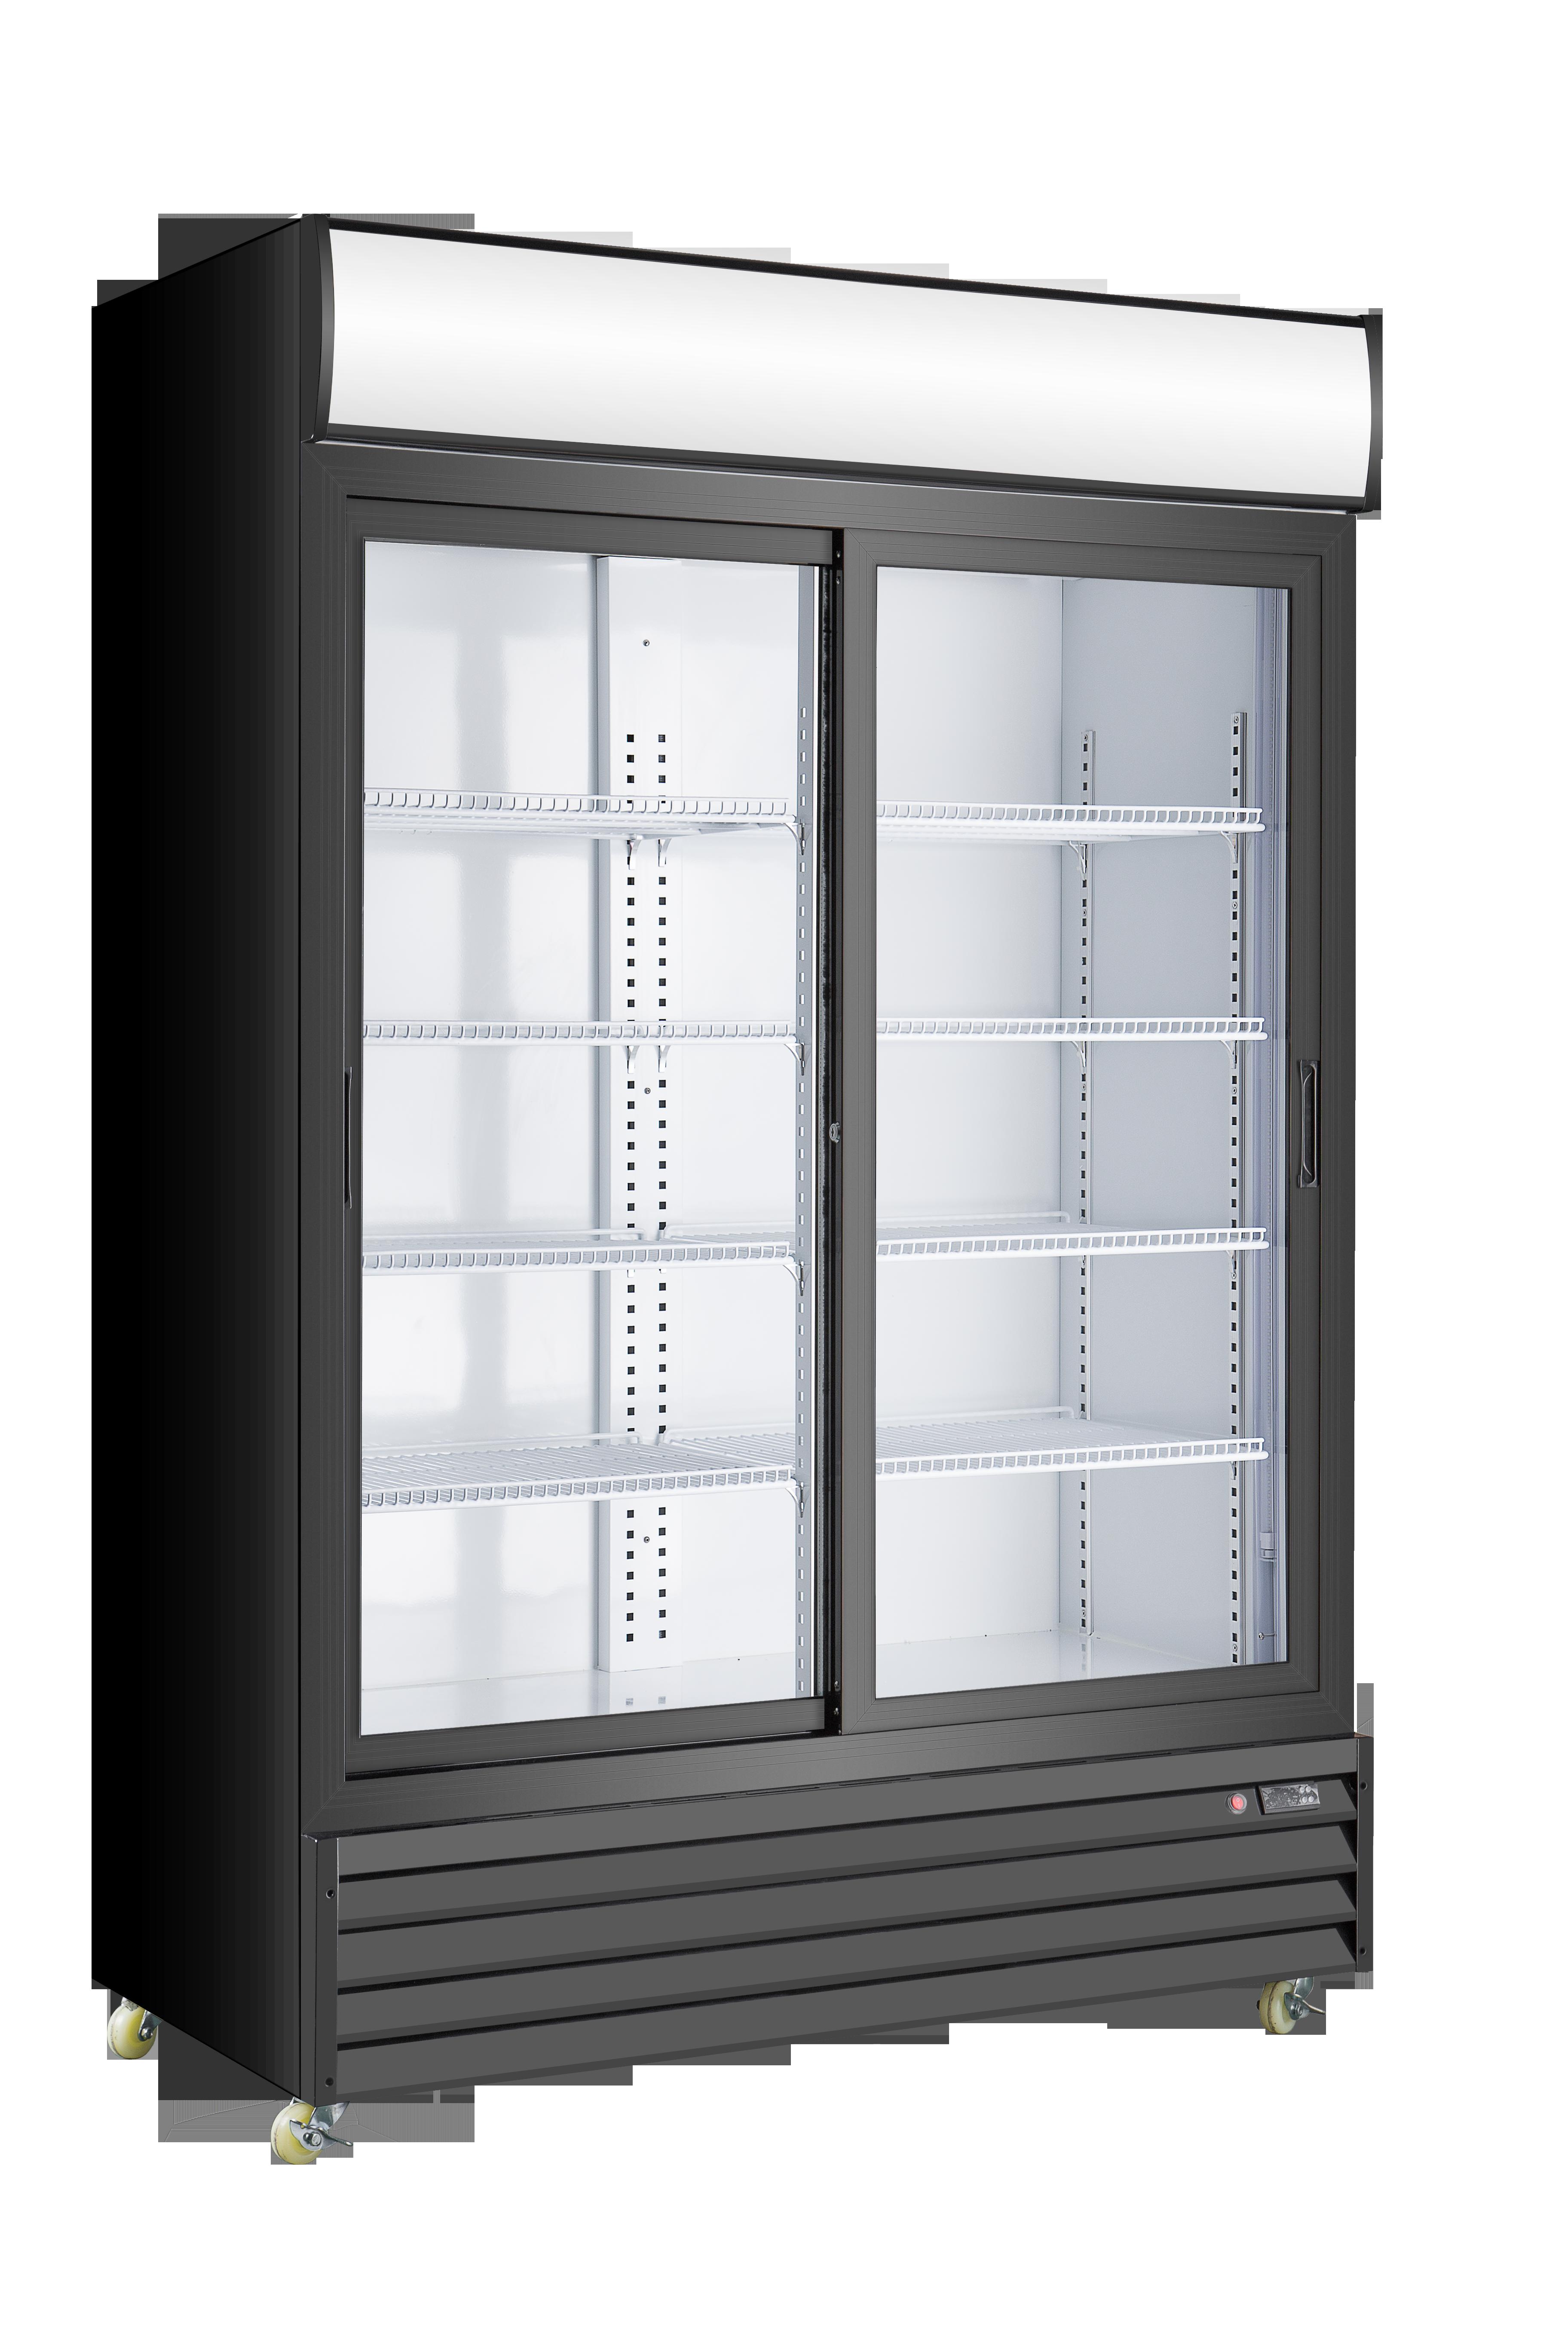 Toronto refrigeration and freezer retailer of hussmann - Glass door refrigerator freezer ...